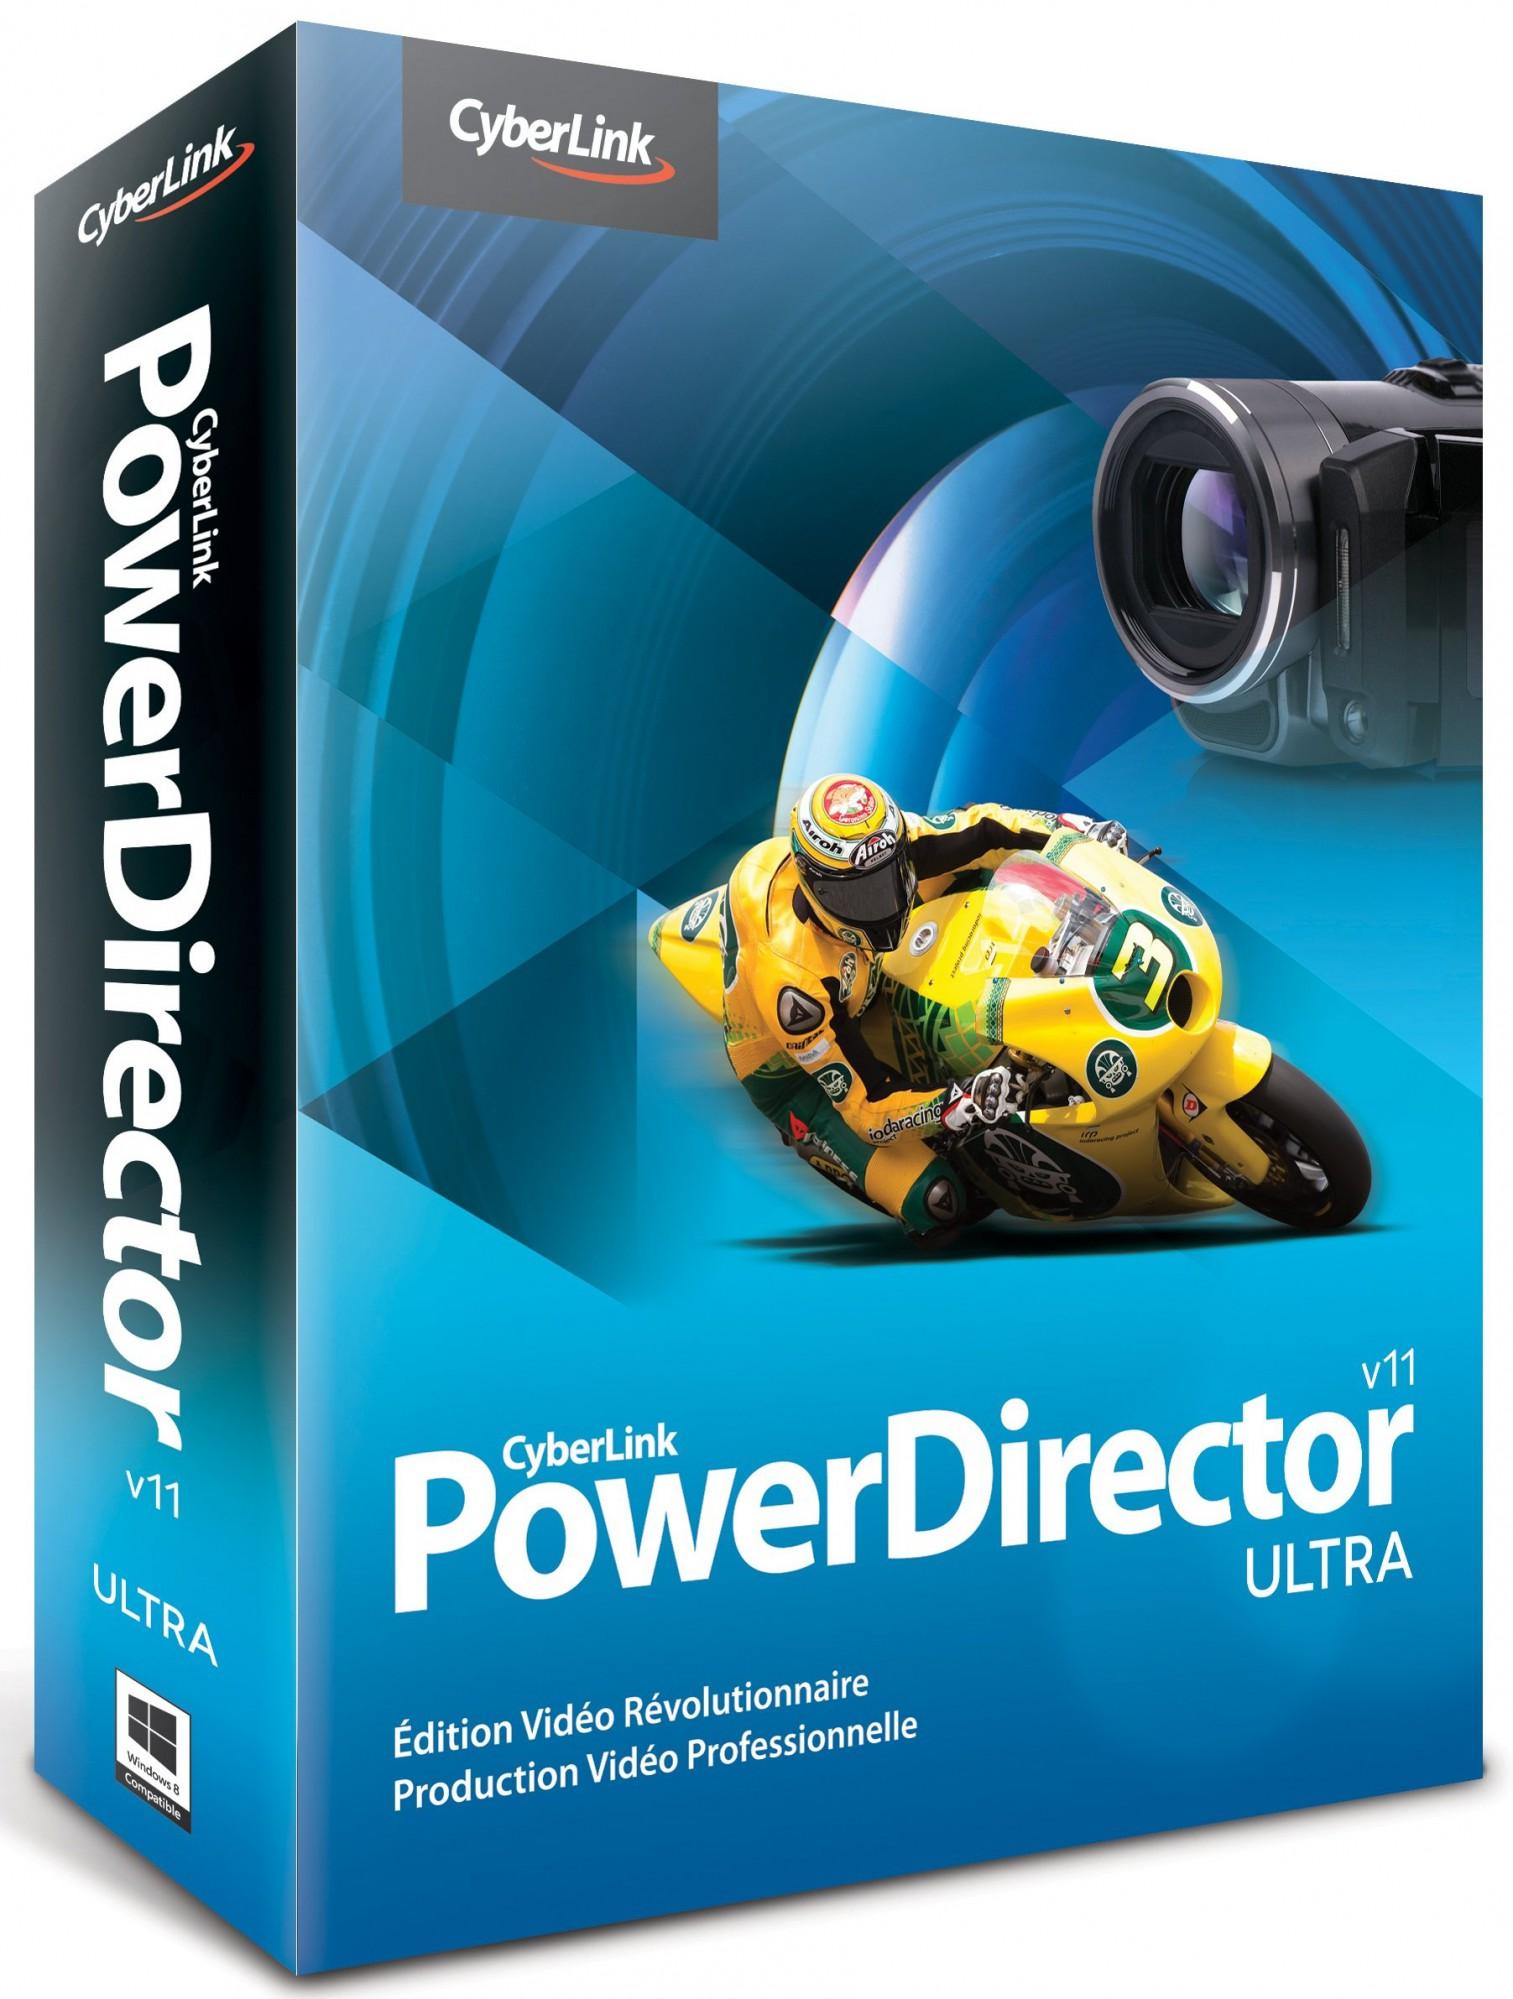 CyberLink PowerDirector v11 ULTRA